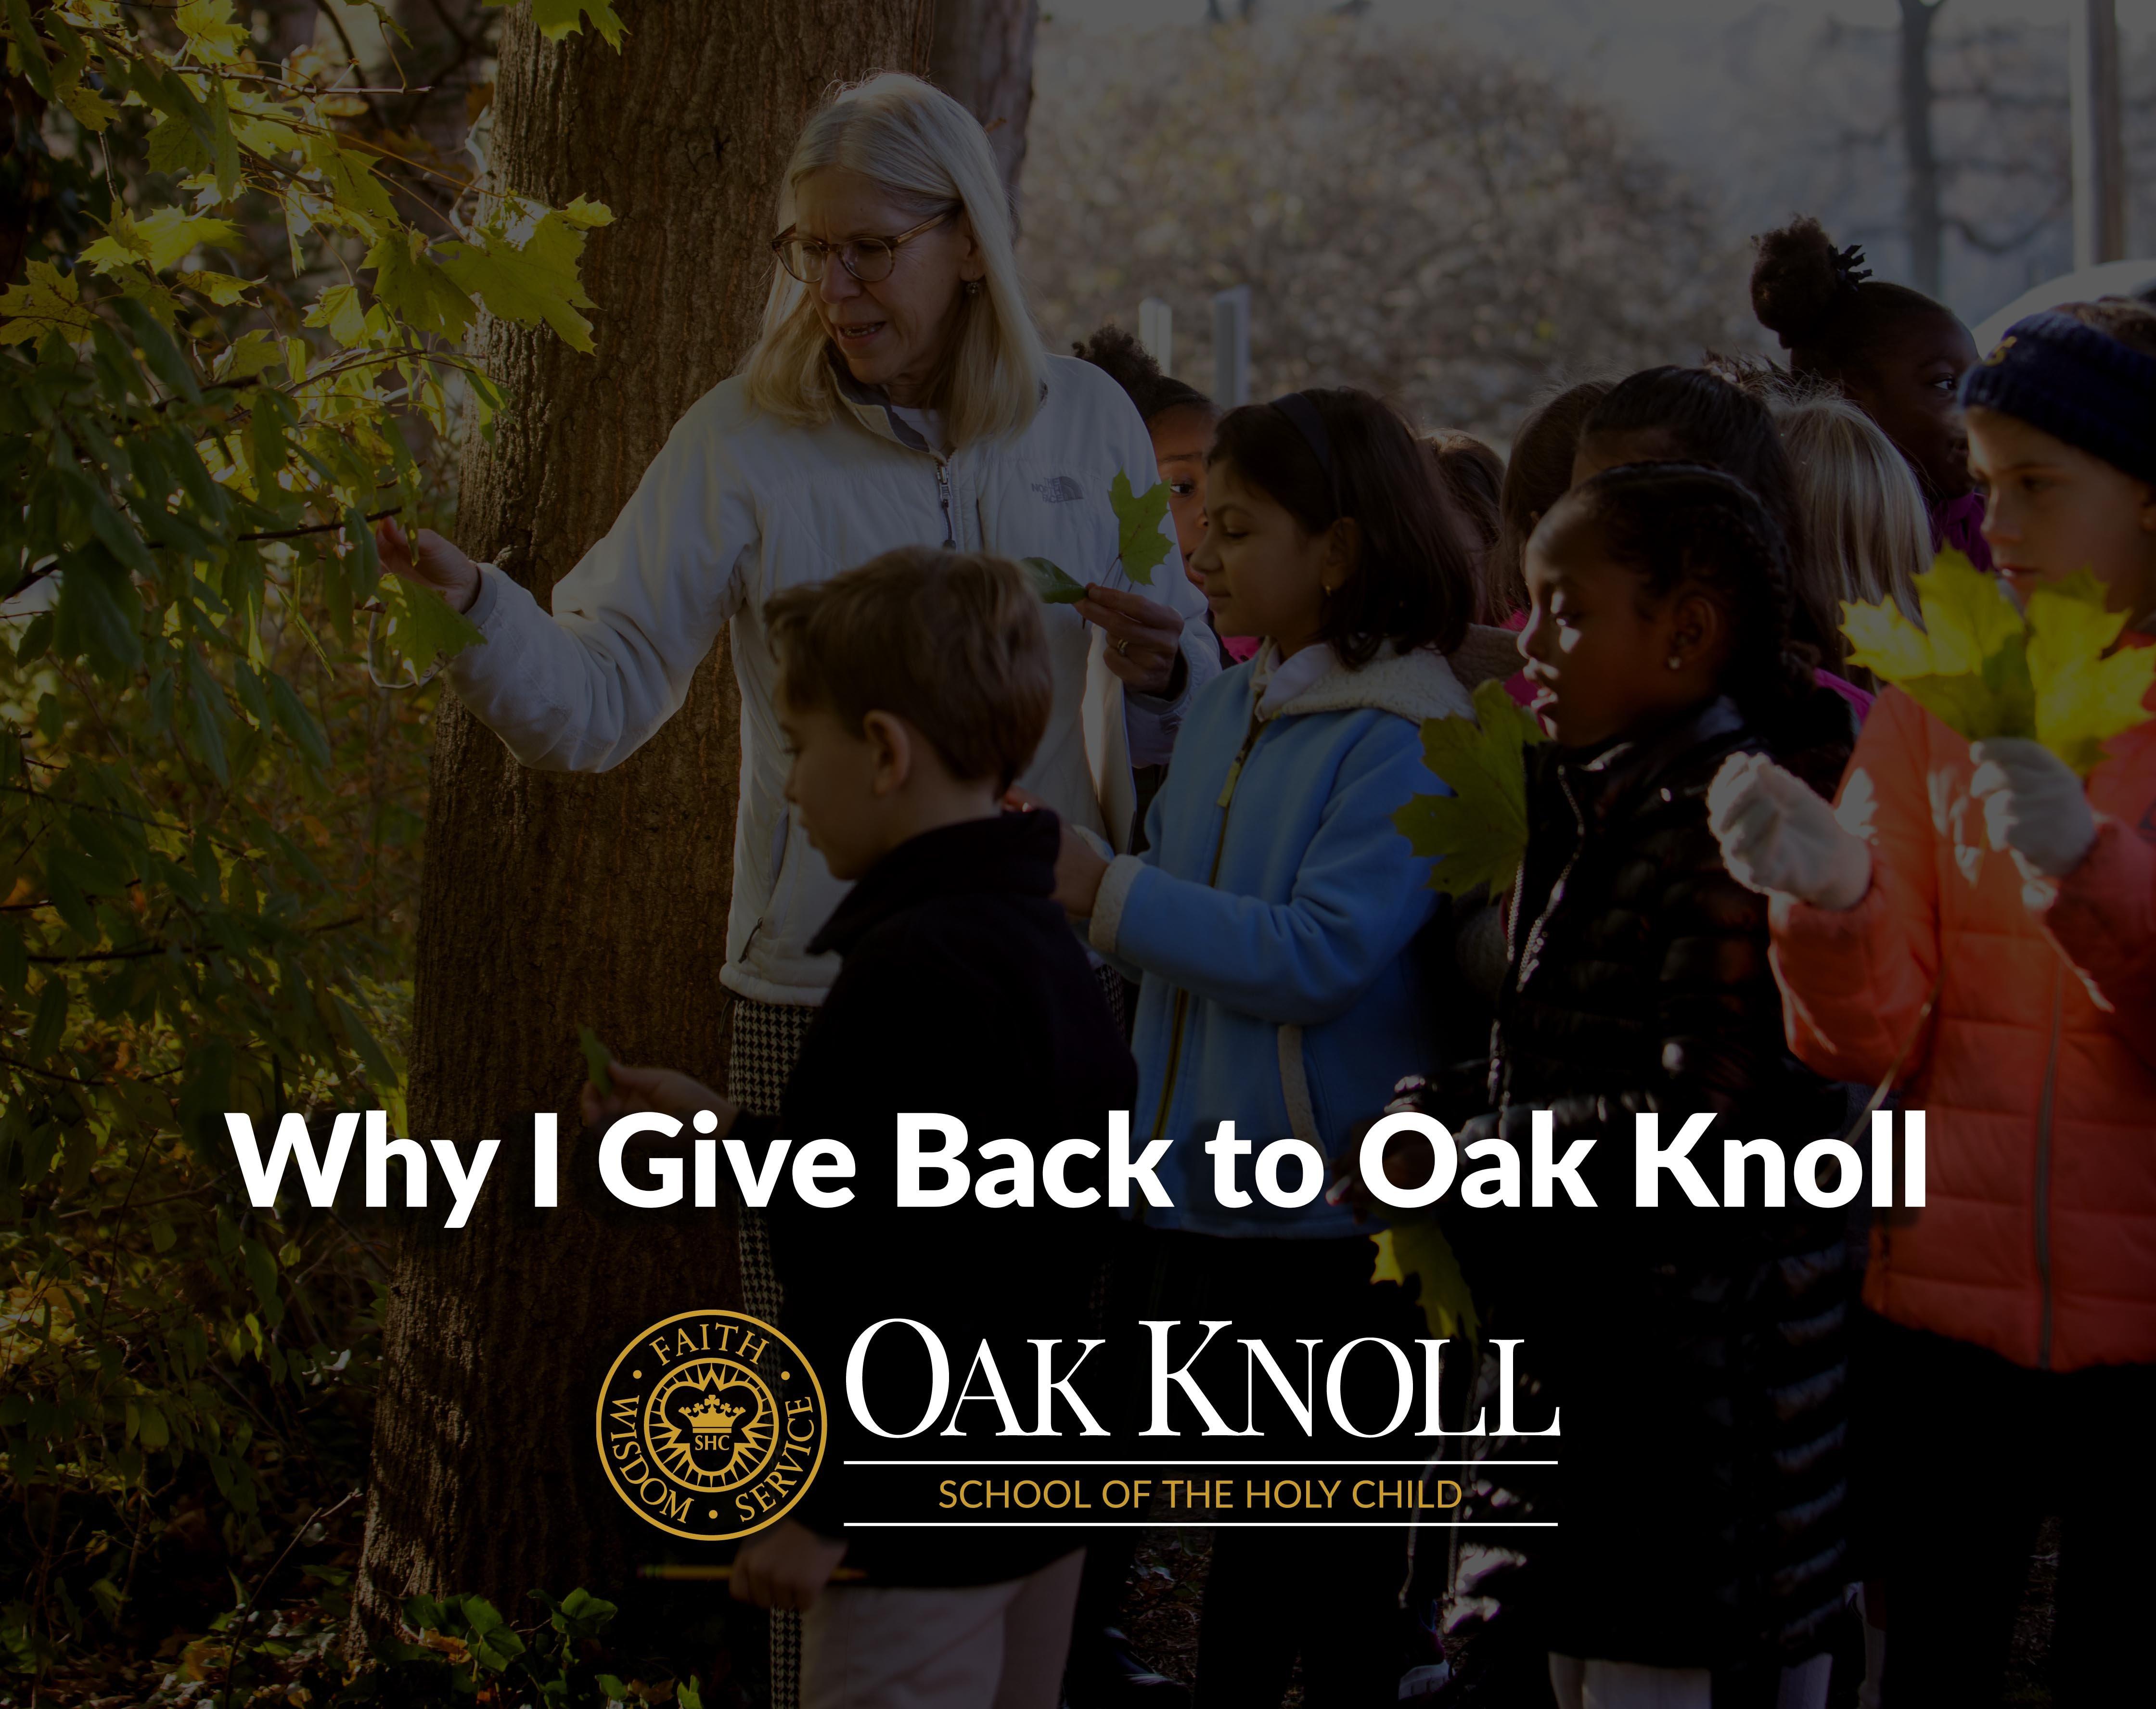 Why I Give Back to Oak Knoll